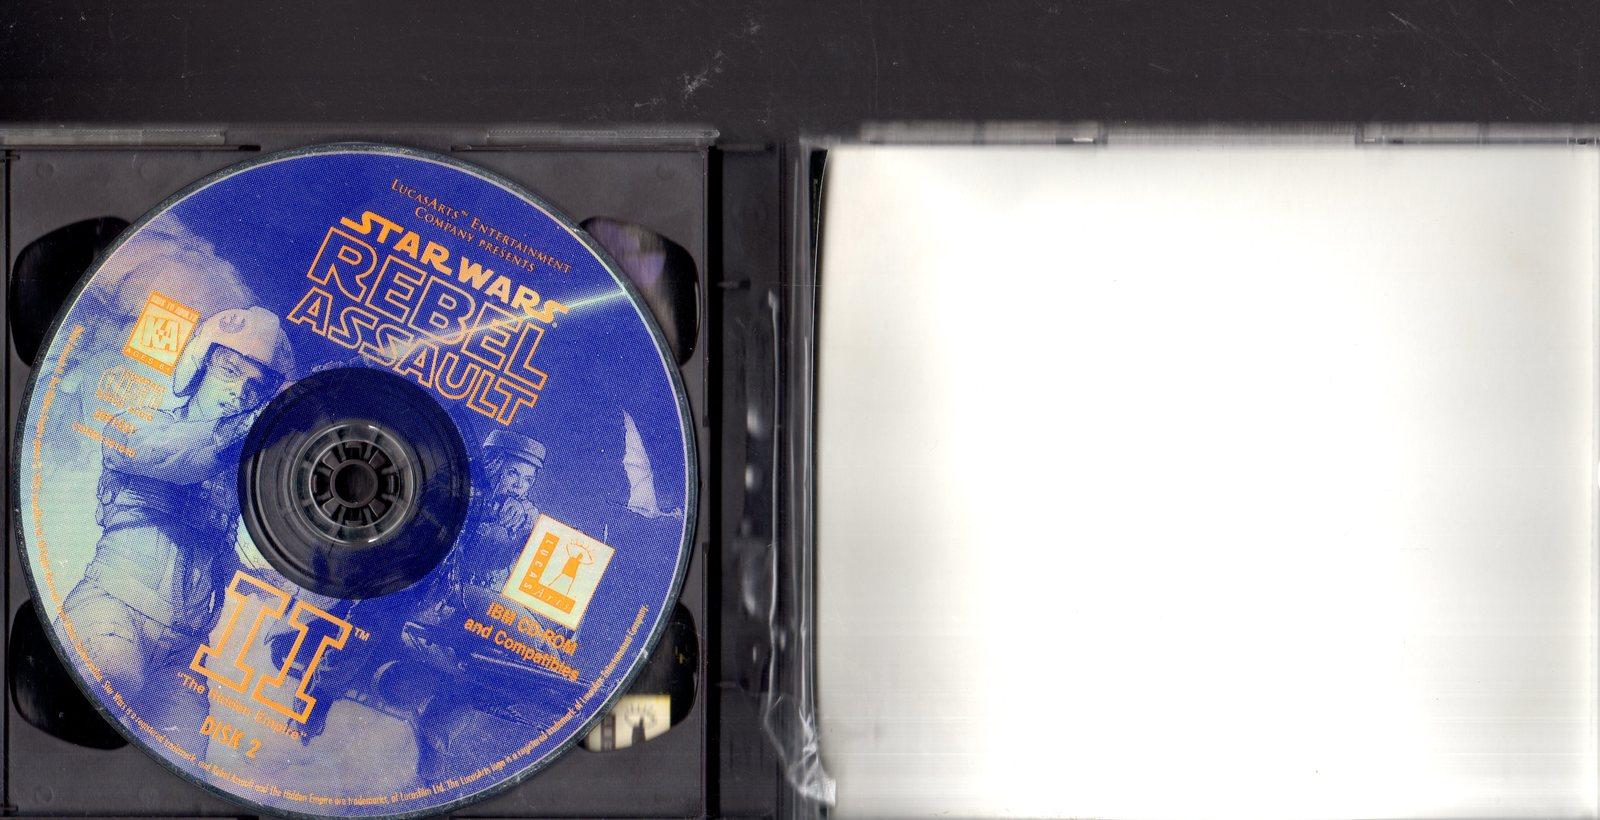 Star Wars - 3 PC Windows Games - Rebellion, Dark Forces, & Rebel Assauly II